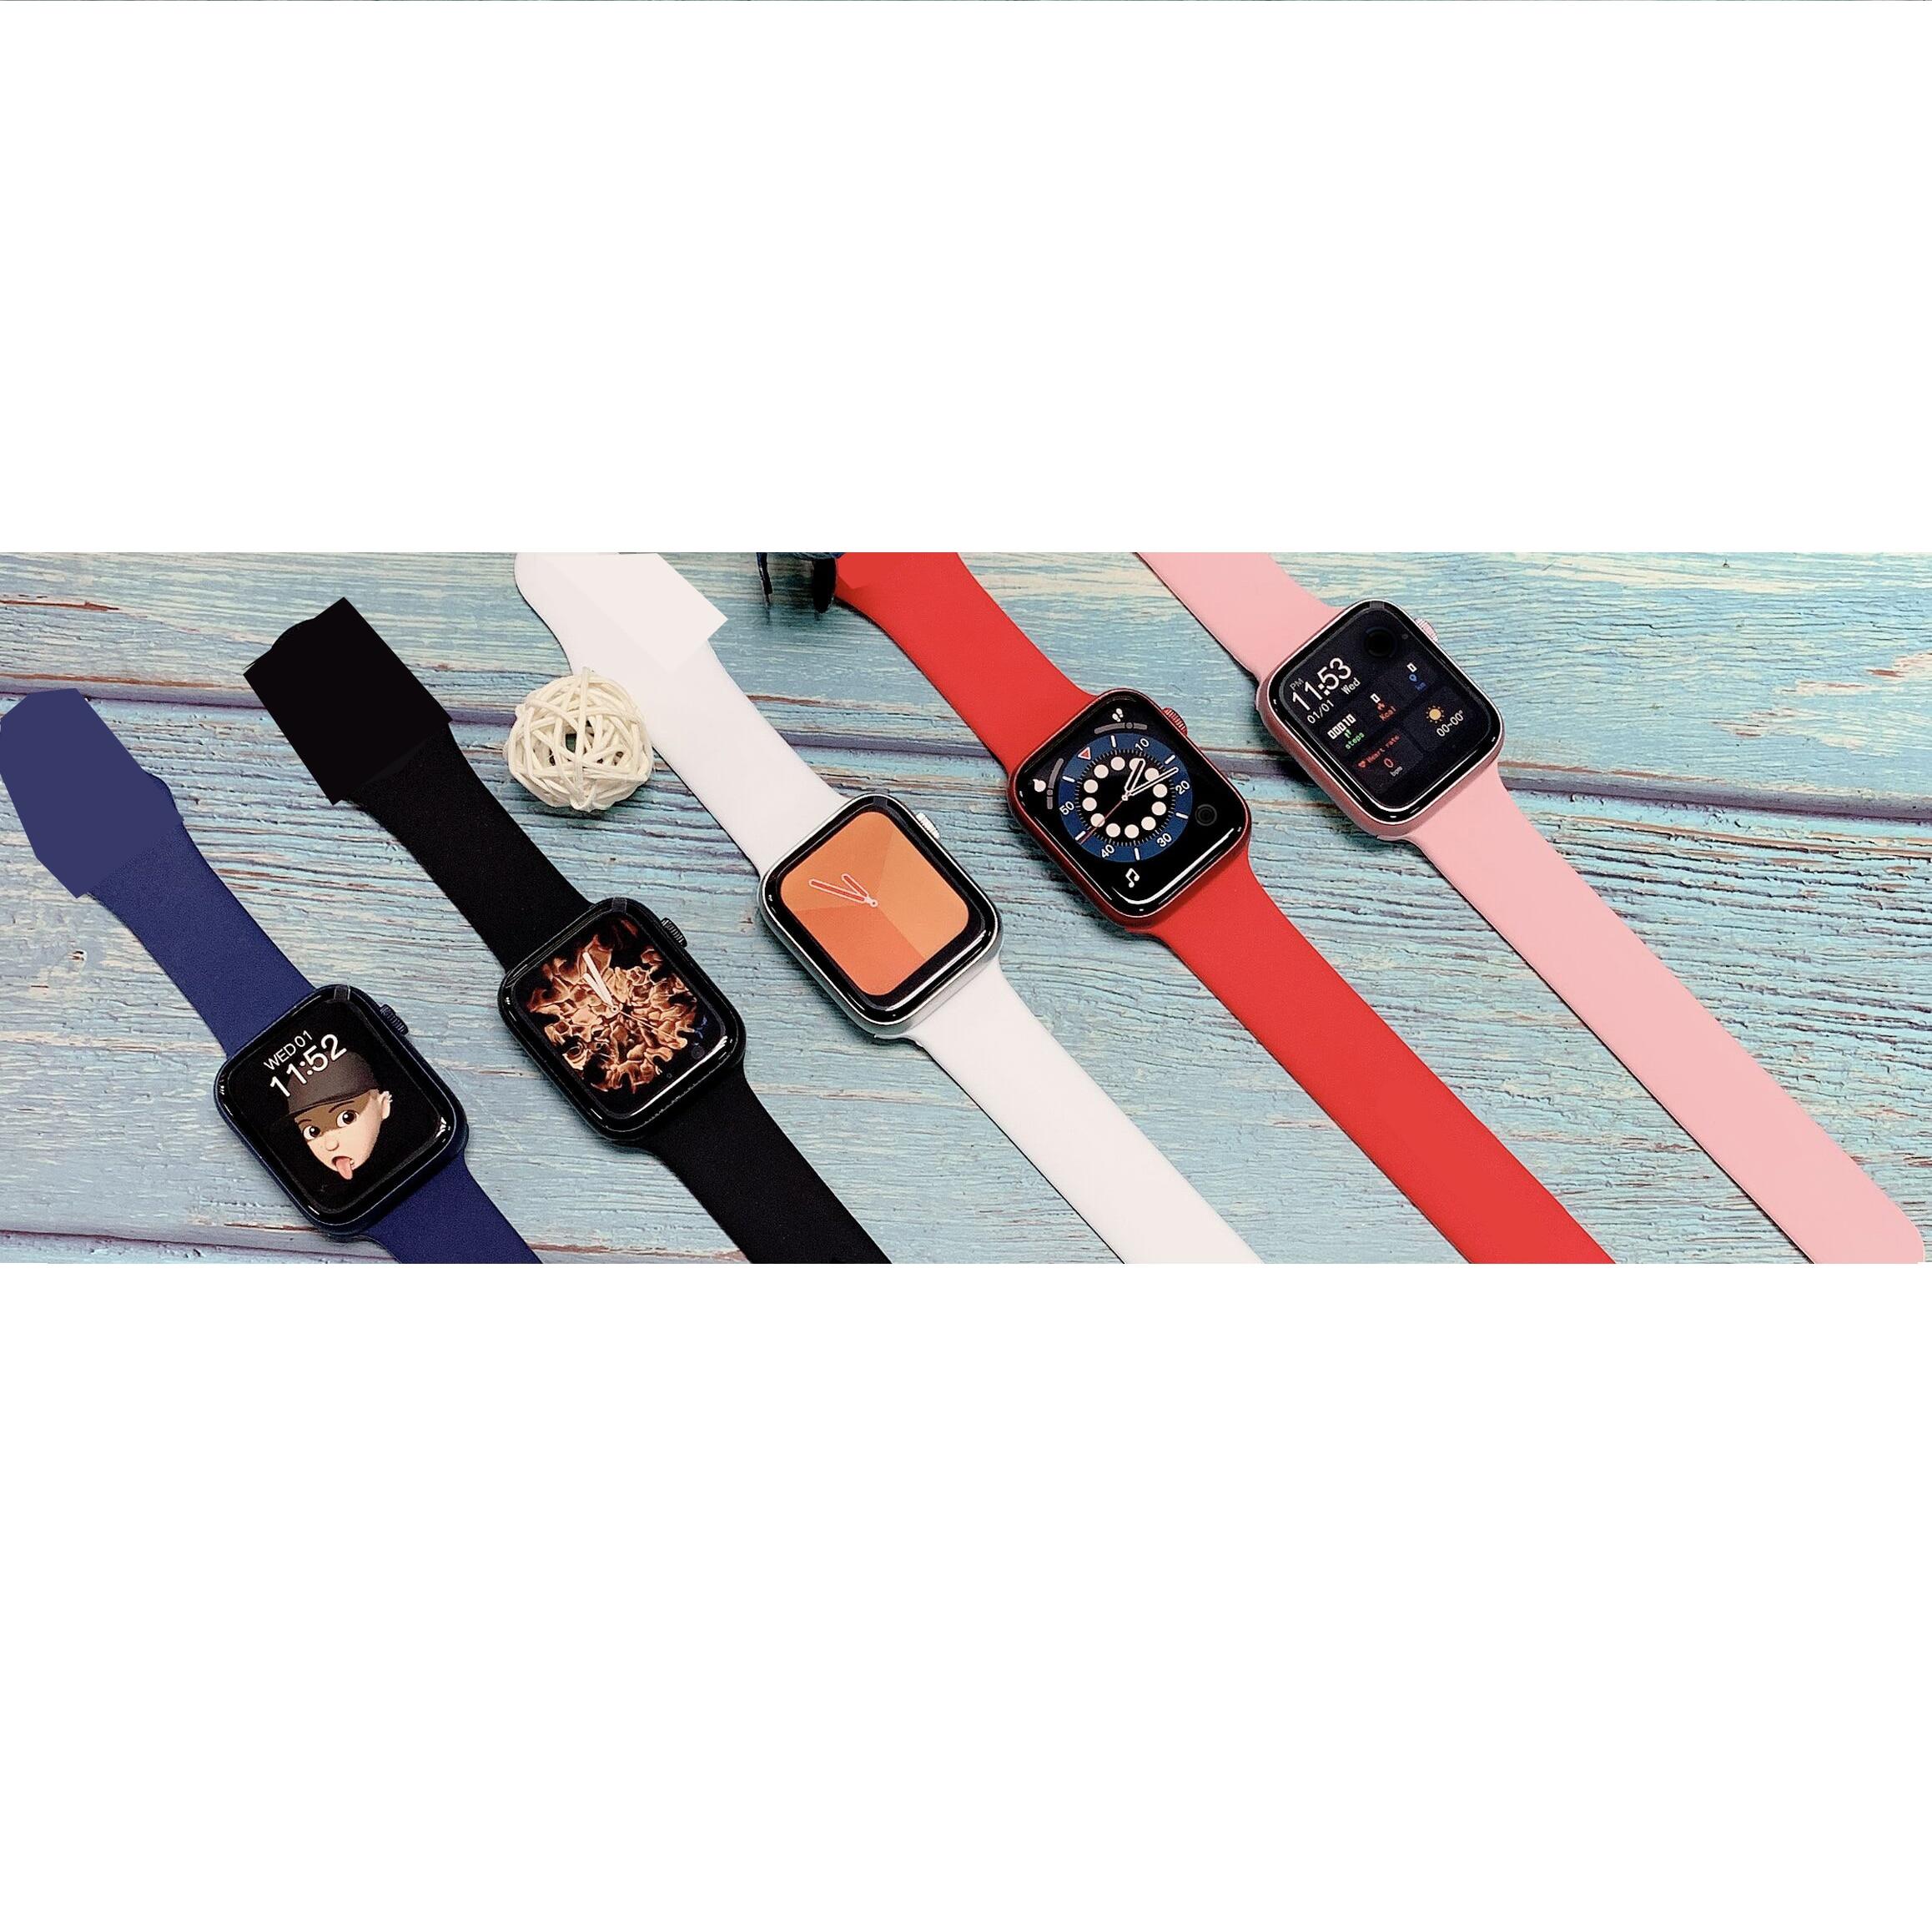 "H25e1220a4f1d416a9eeebe11cb10737bX 2021 IWO 13 MAX Smart Watch T500+ plus 1.75""HD Bluetooth Calls Custom Wallpaper Heart Rate Monitor Sport Smartwatch PK W46 W26"